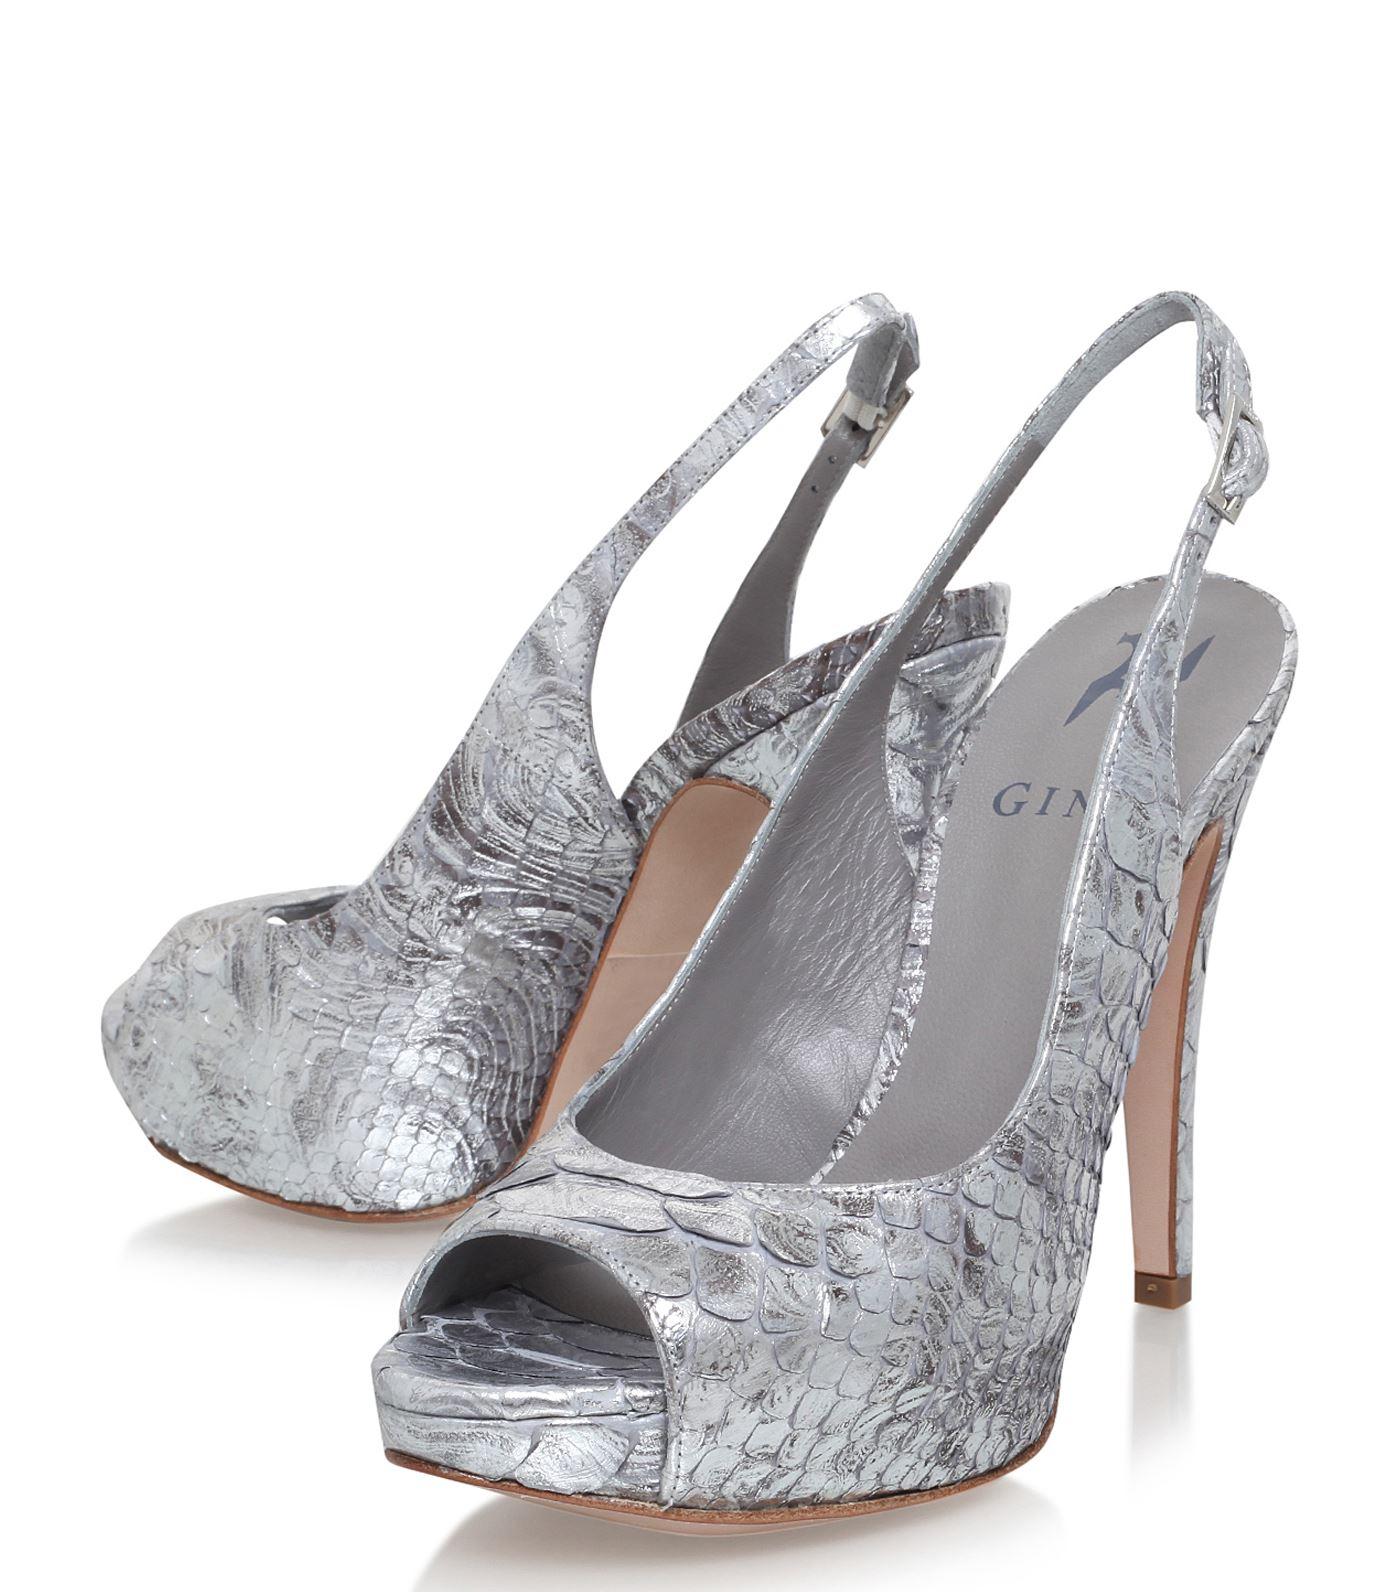 gina shoes ... shoes: court heels gina boa peep toe court shoes cypbqzm